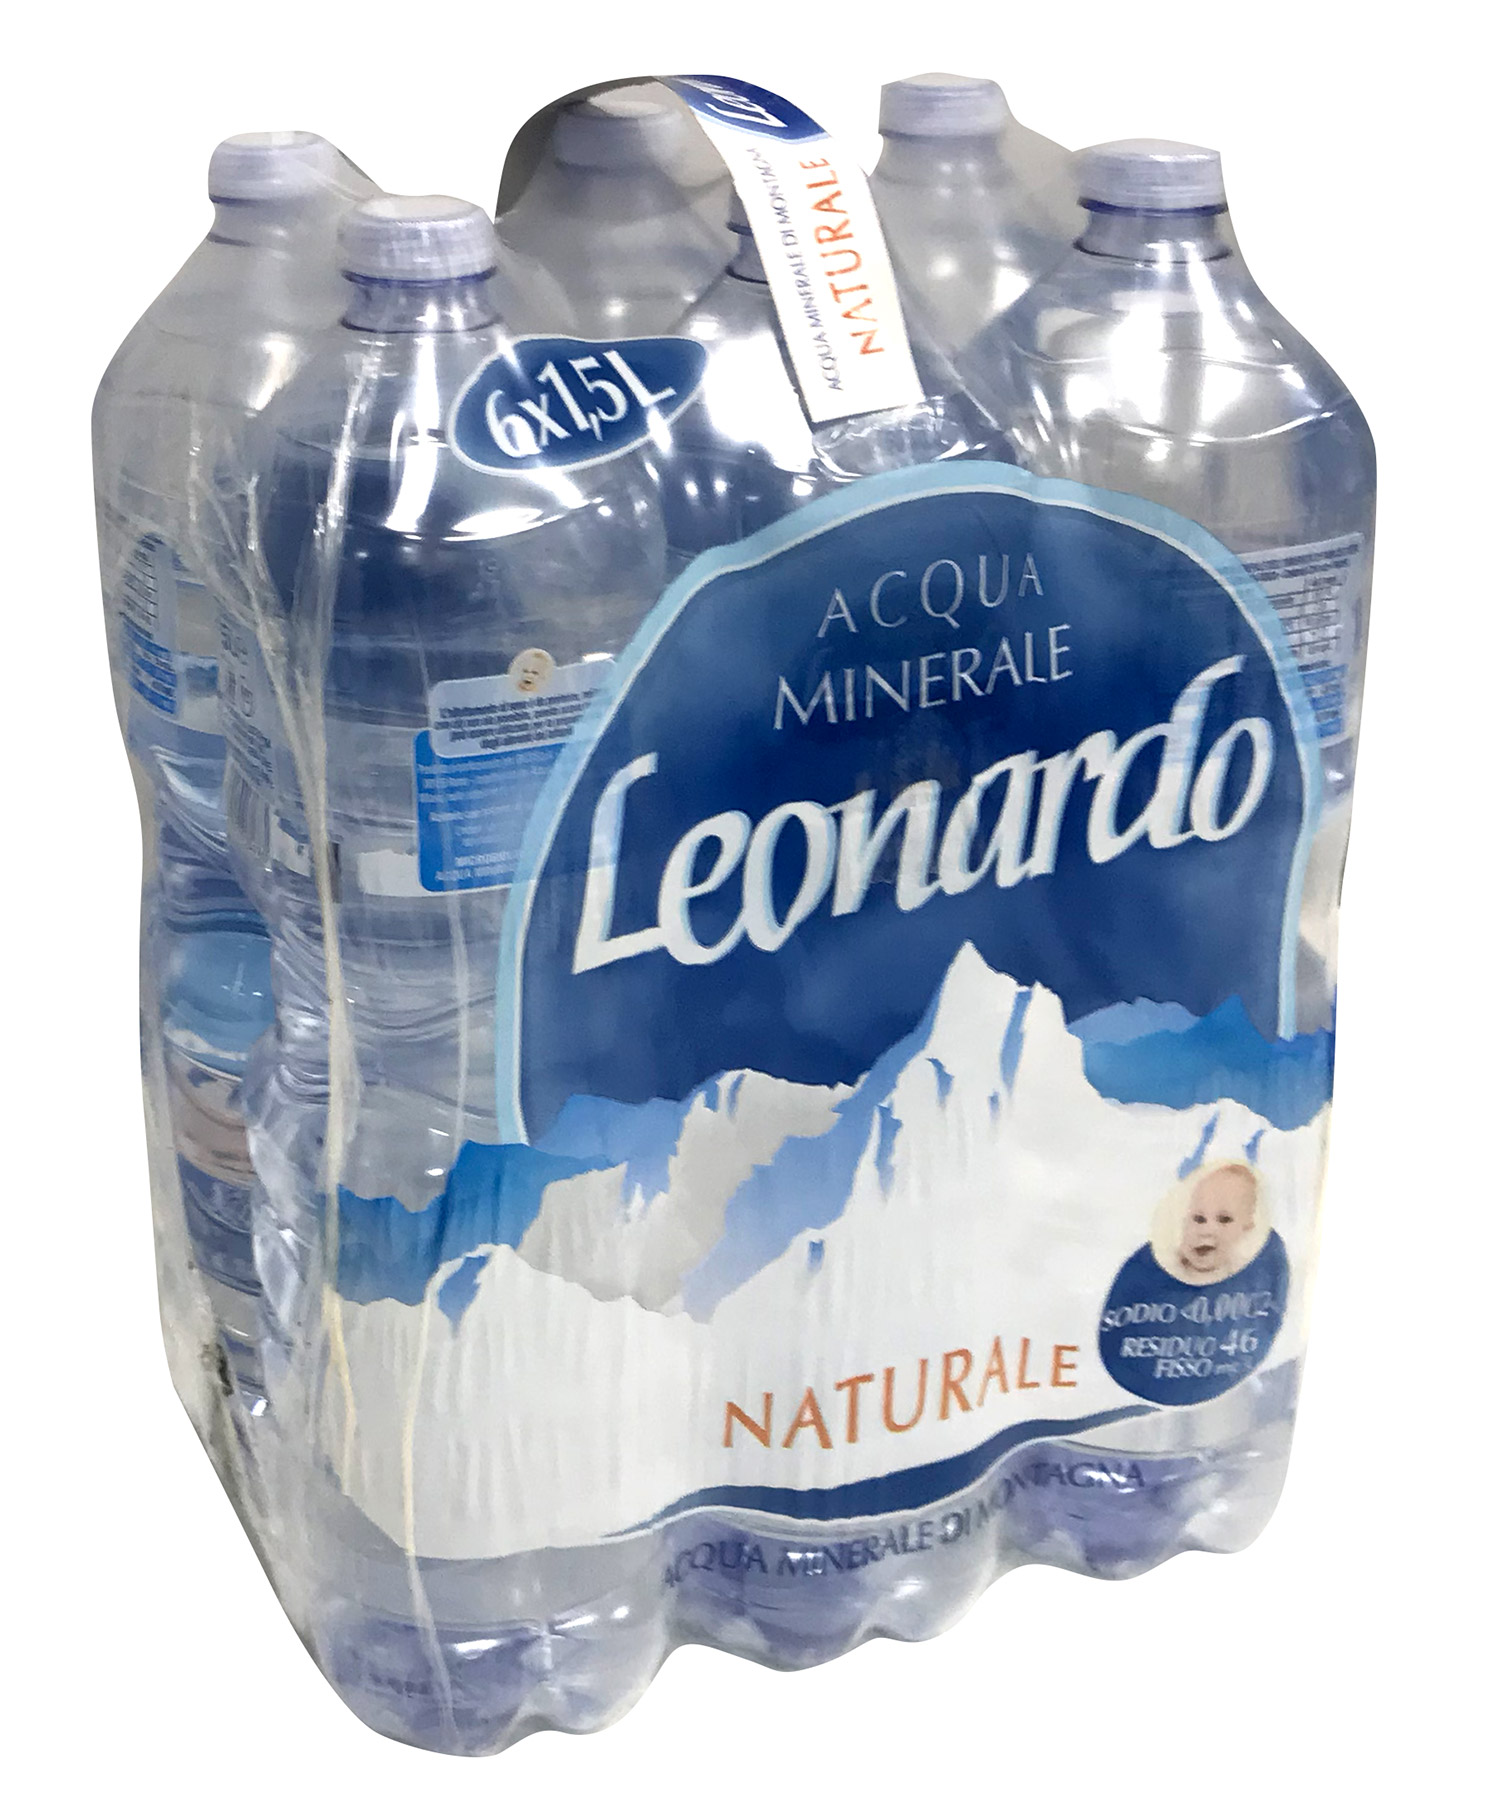 Acqua Naturale Leonardo